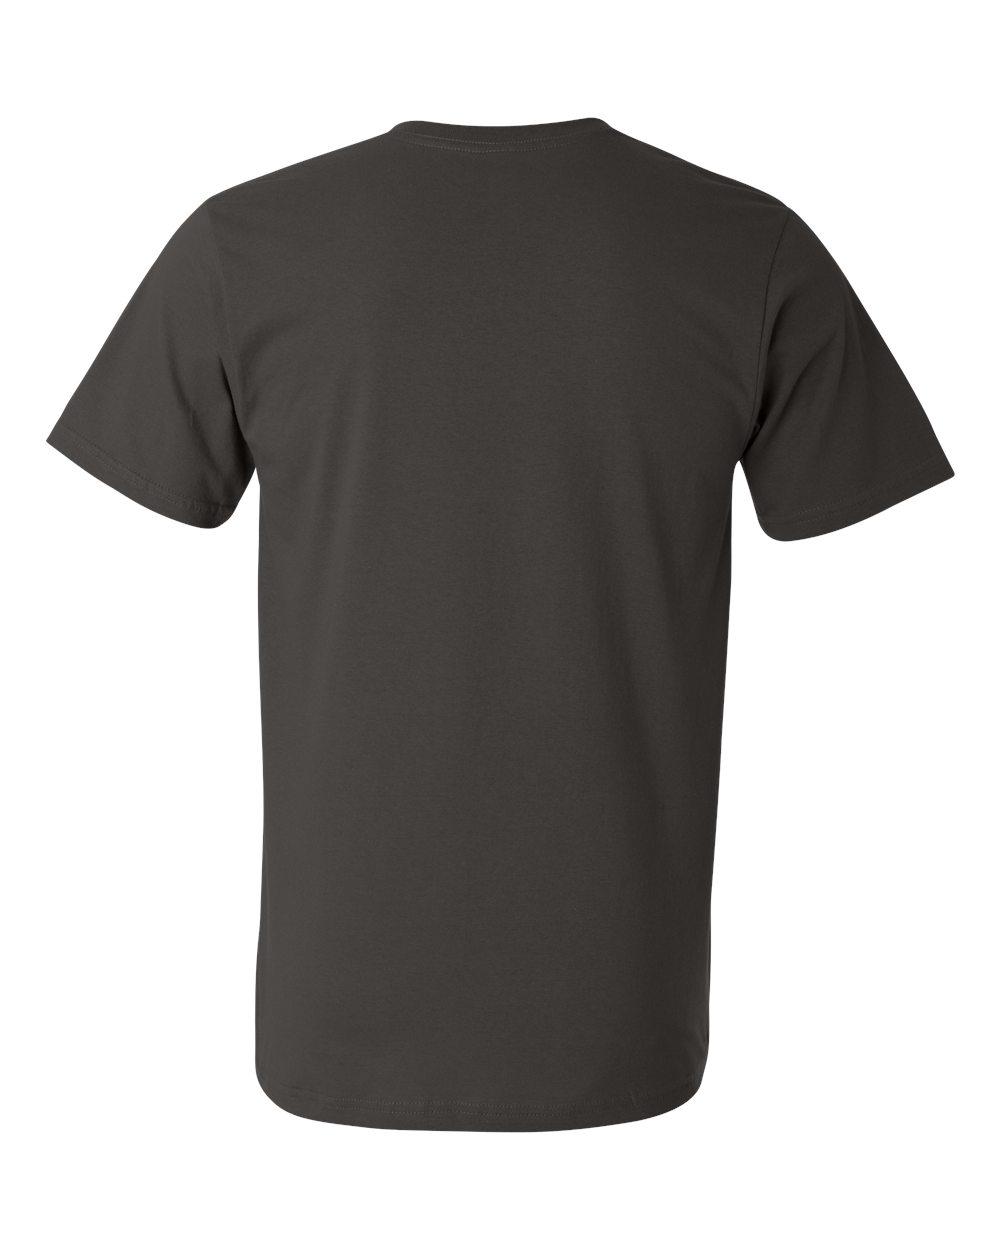 Anvil-Men-039-s-Lightweight-V-Neck-T-Shirt-982-S-3XL thumbnail 25